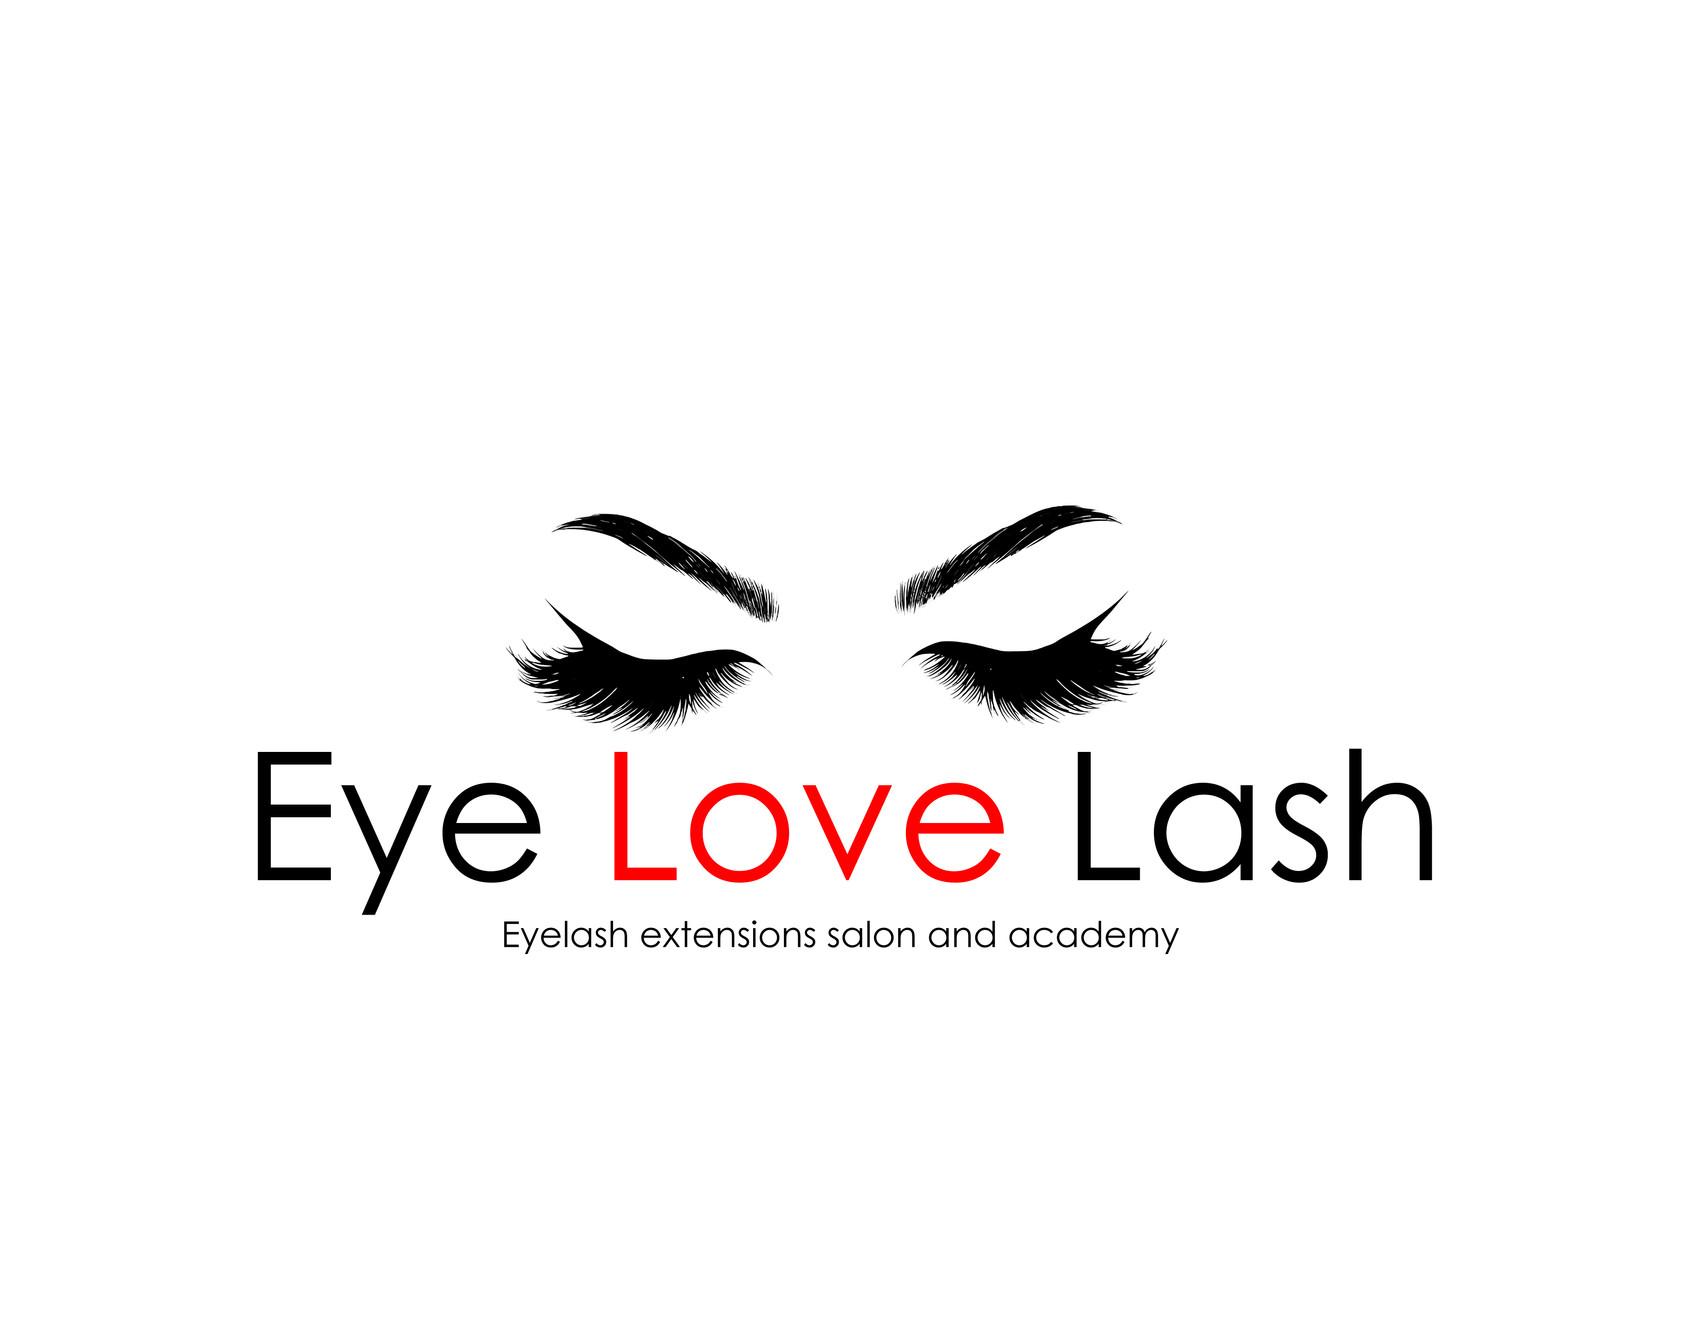 Eyelash Extensions Barrie | Eye Love Lash Salon and Academy